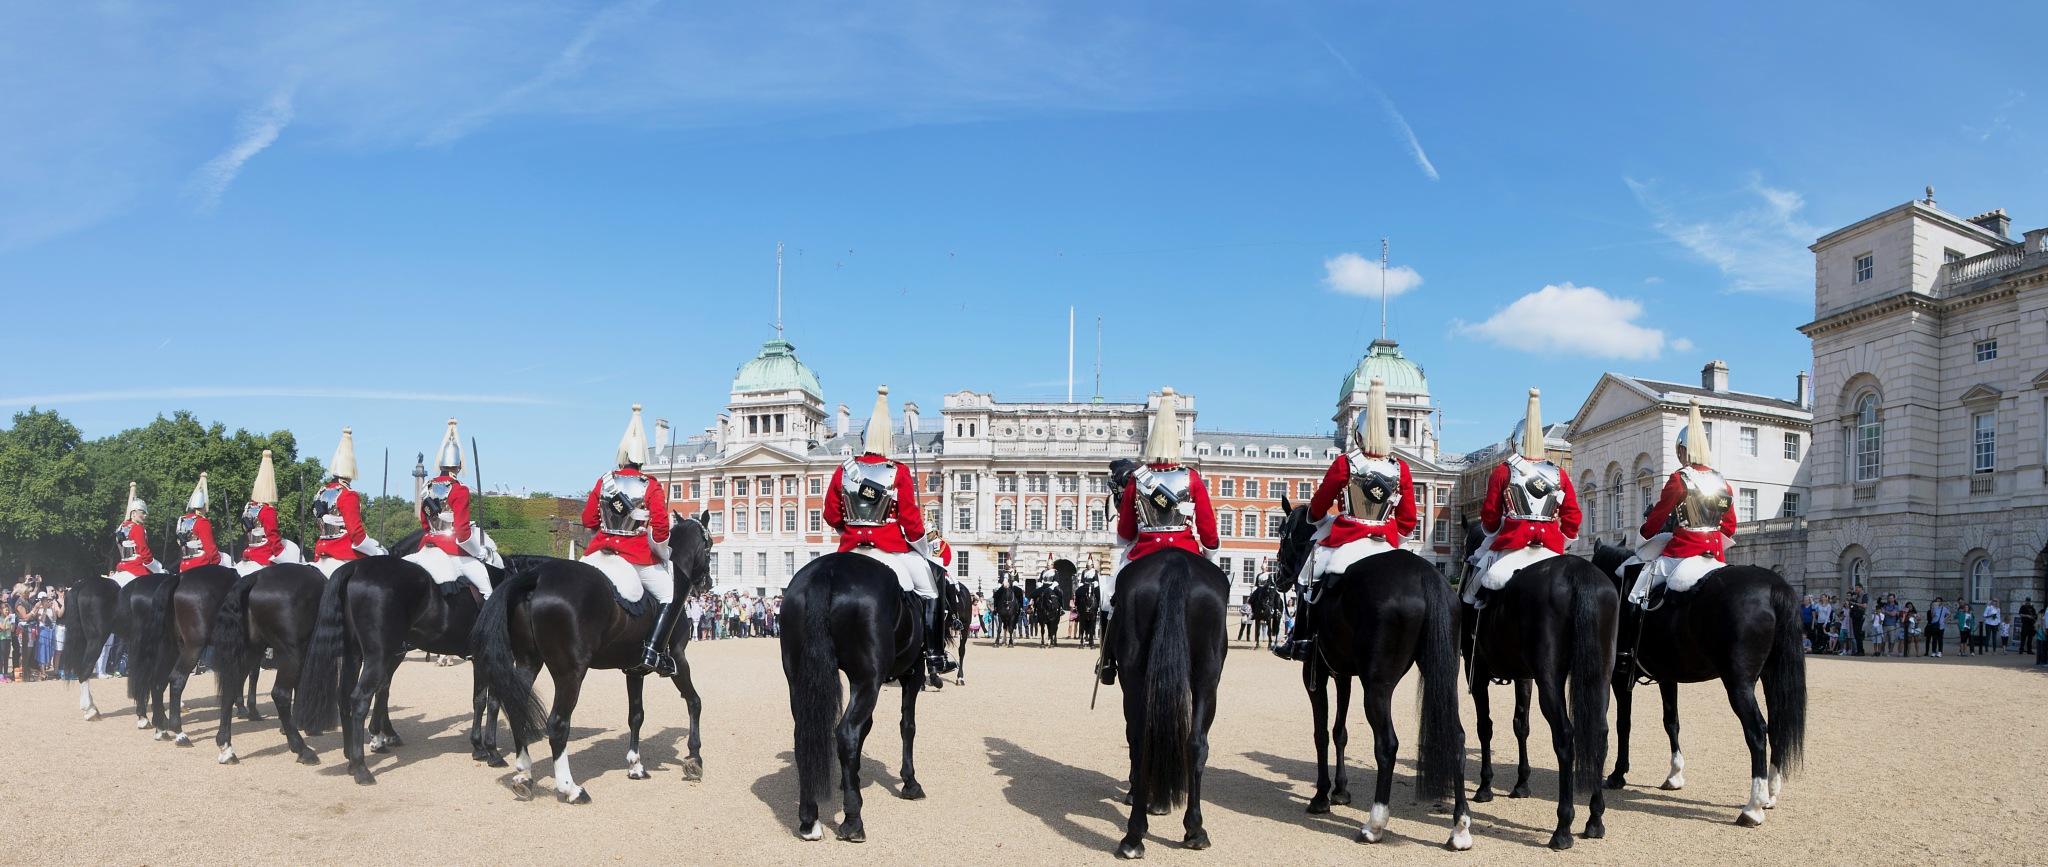 Horse Guards Parade by gkkosmetik